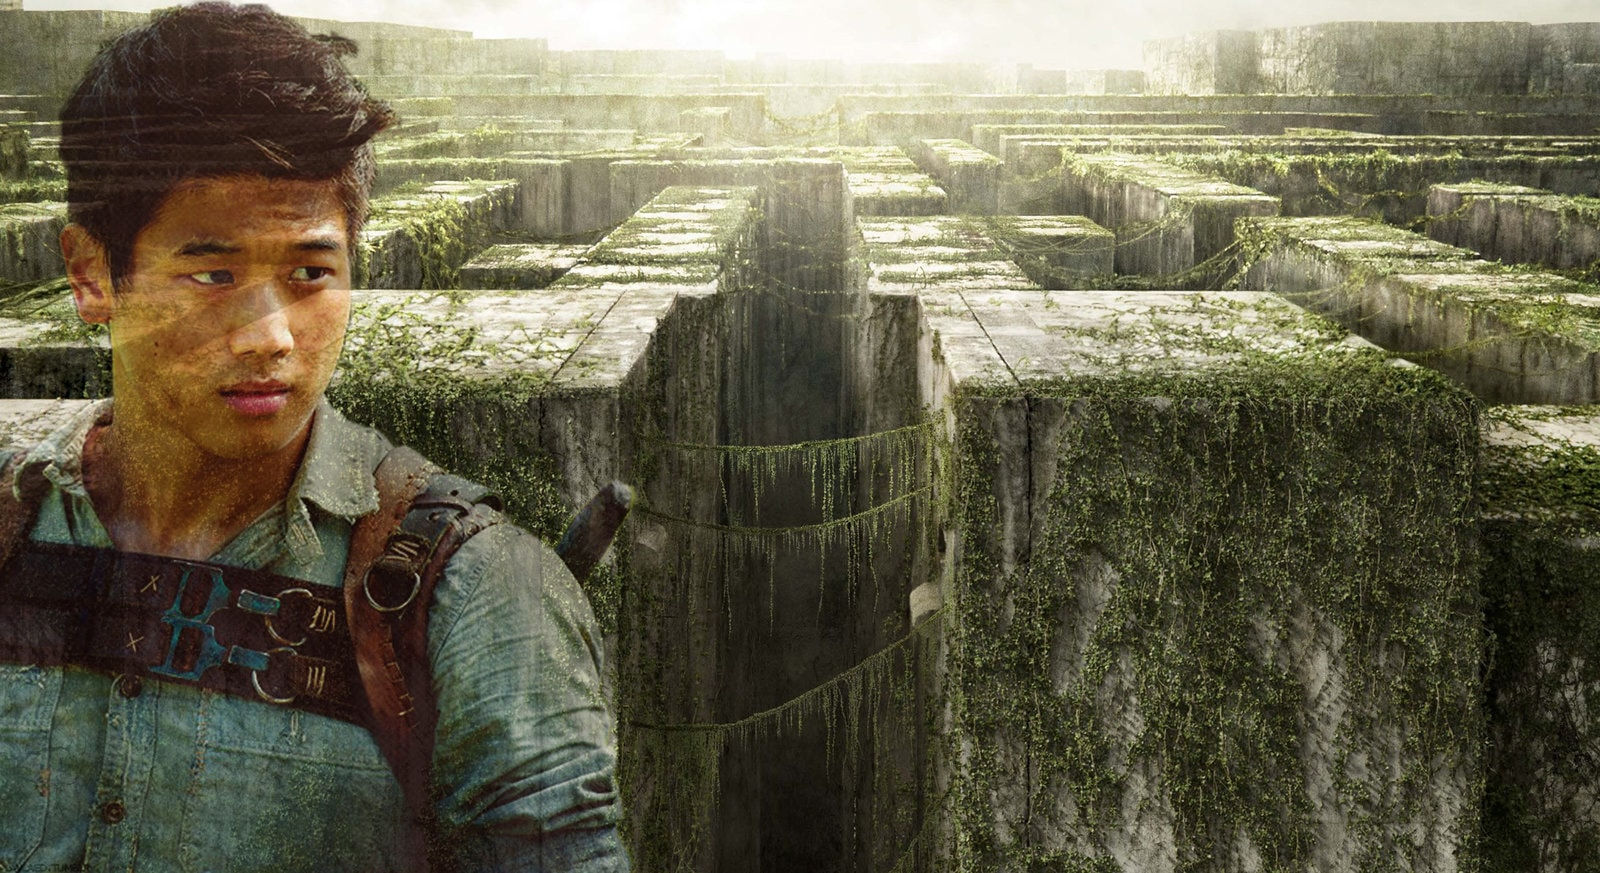 The Maze Runner Wallpaper